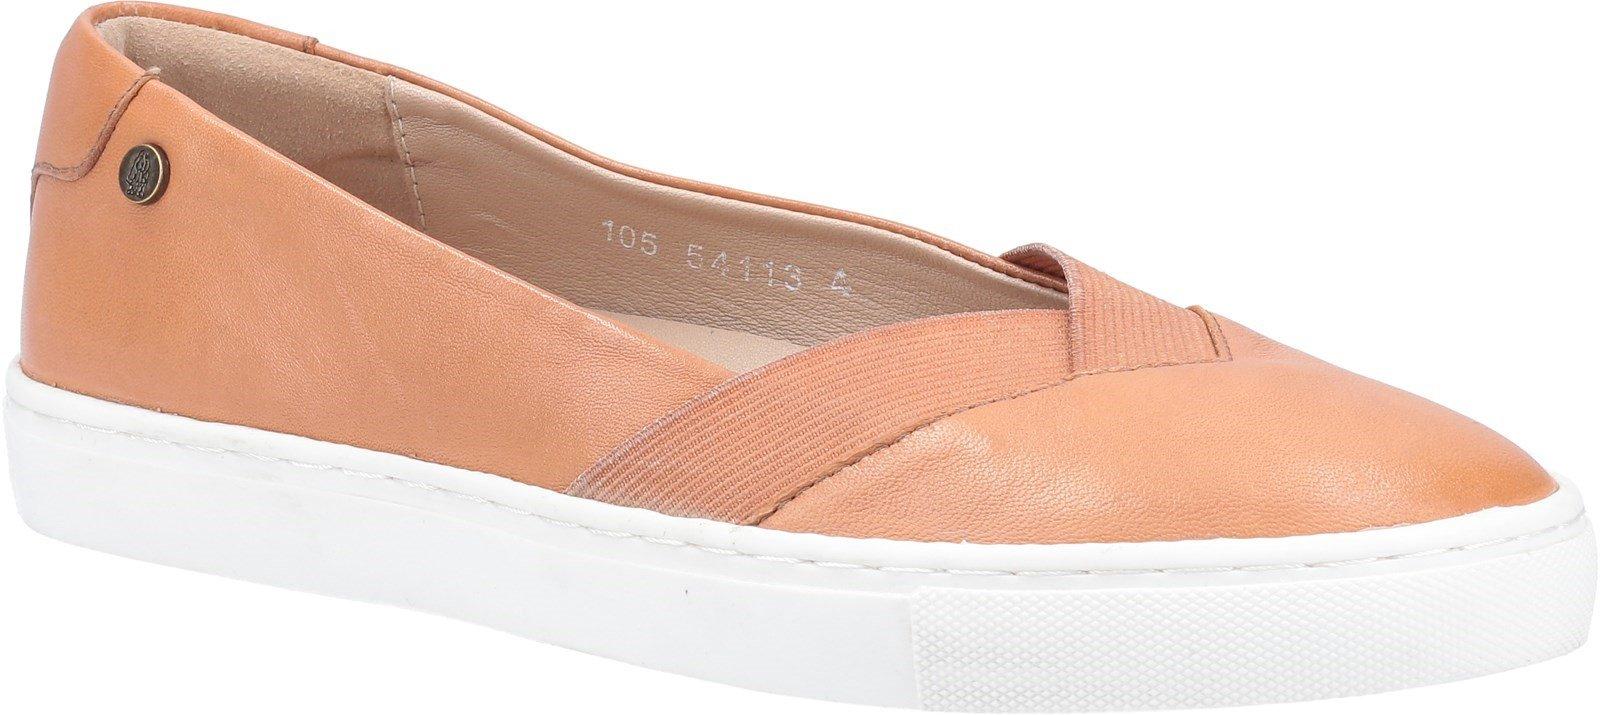 Hush Puppies Women's Tiffany Slip On Flat Shoe Various Colours 31962 - Tan 3